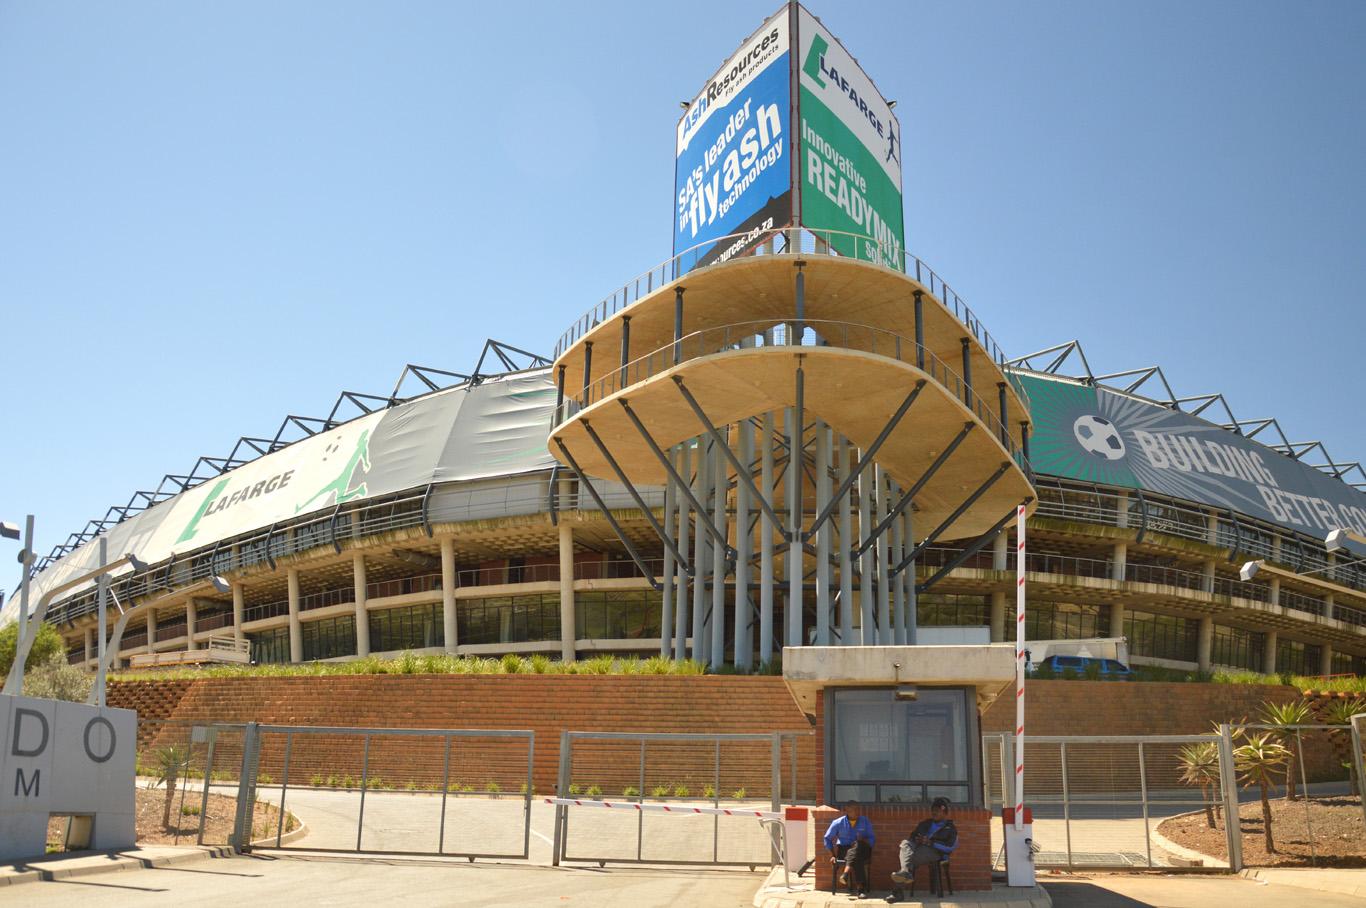 Soweto also has its own stadium